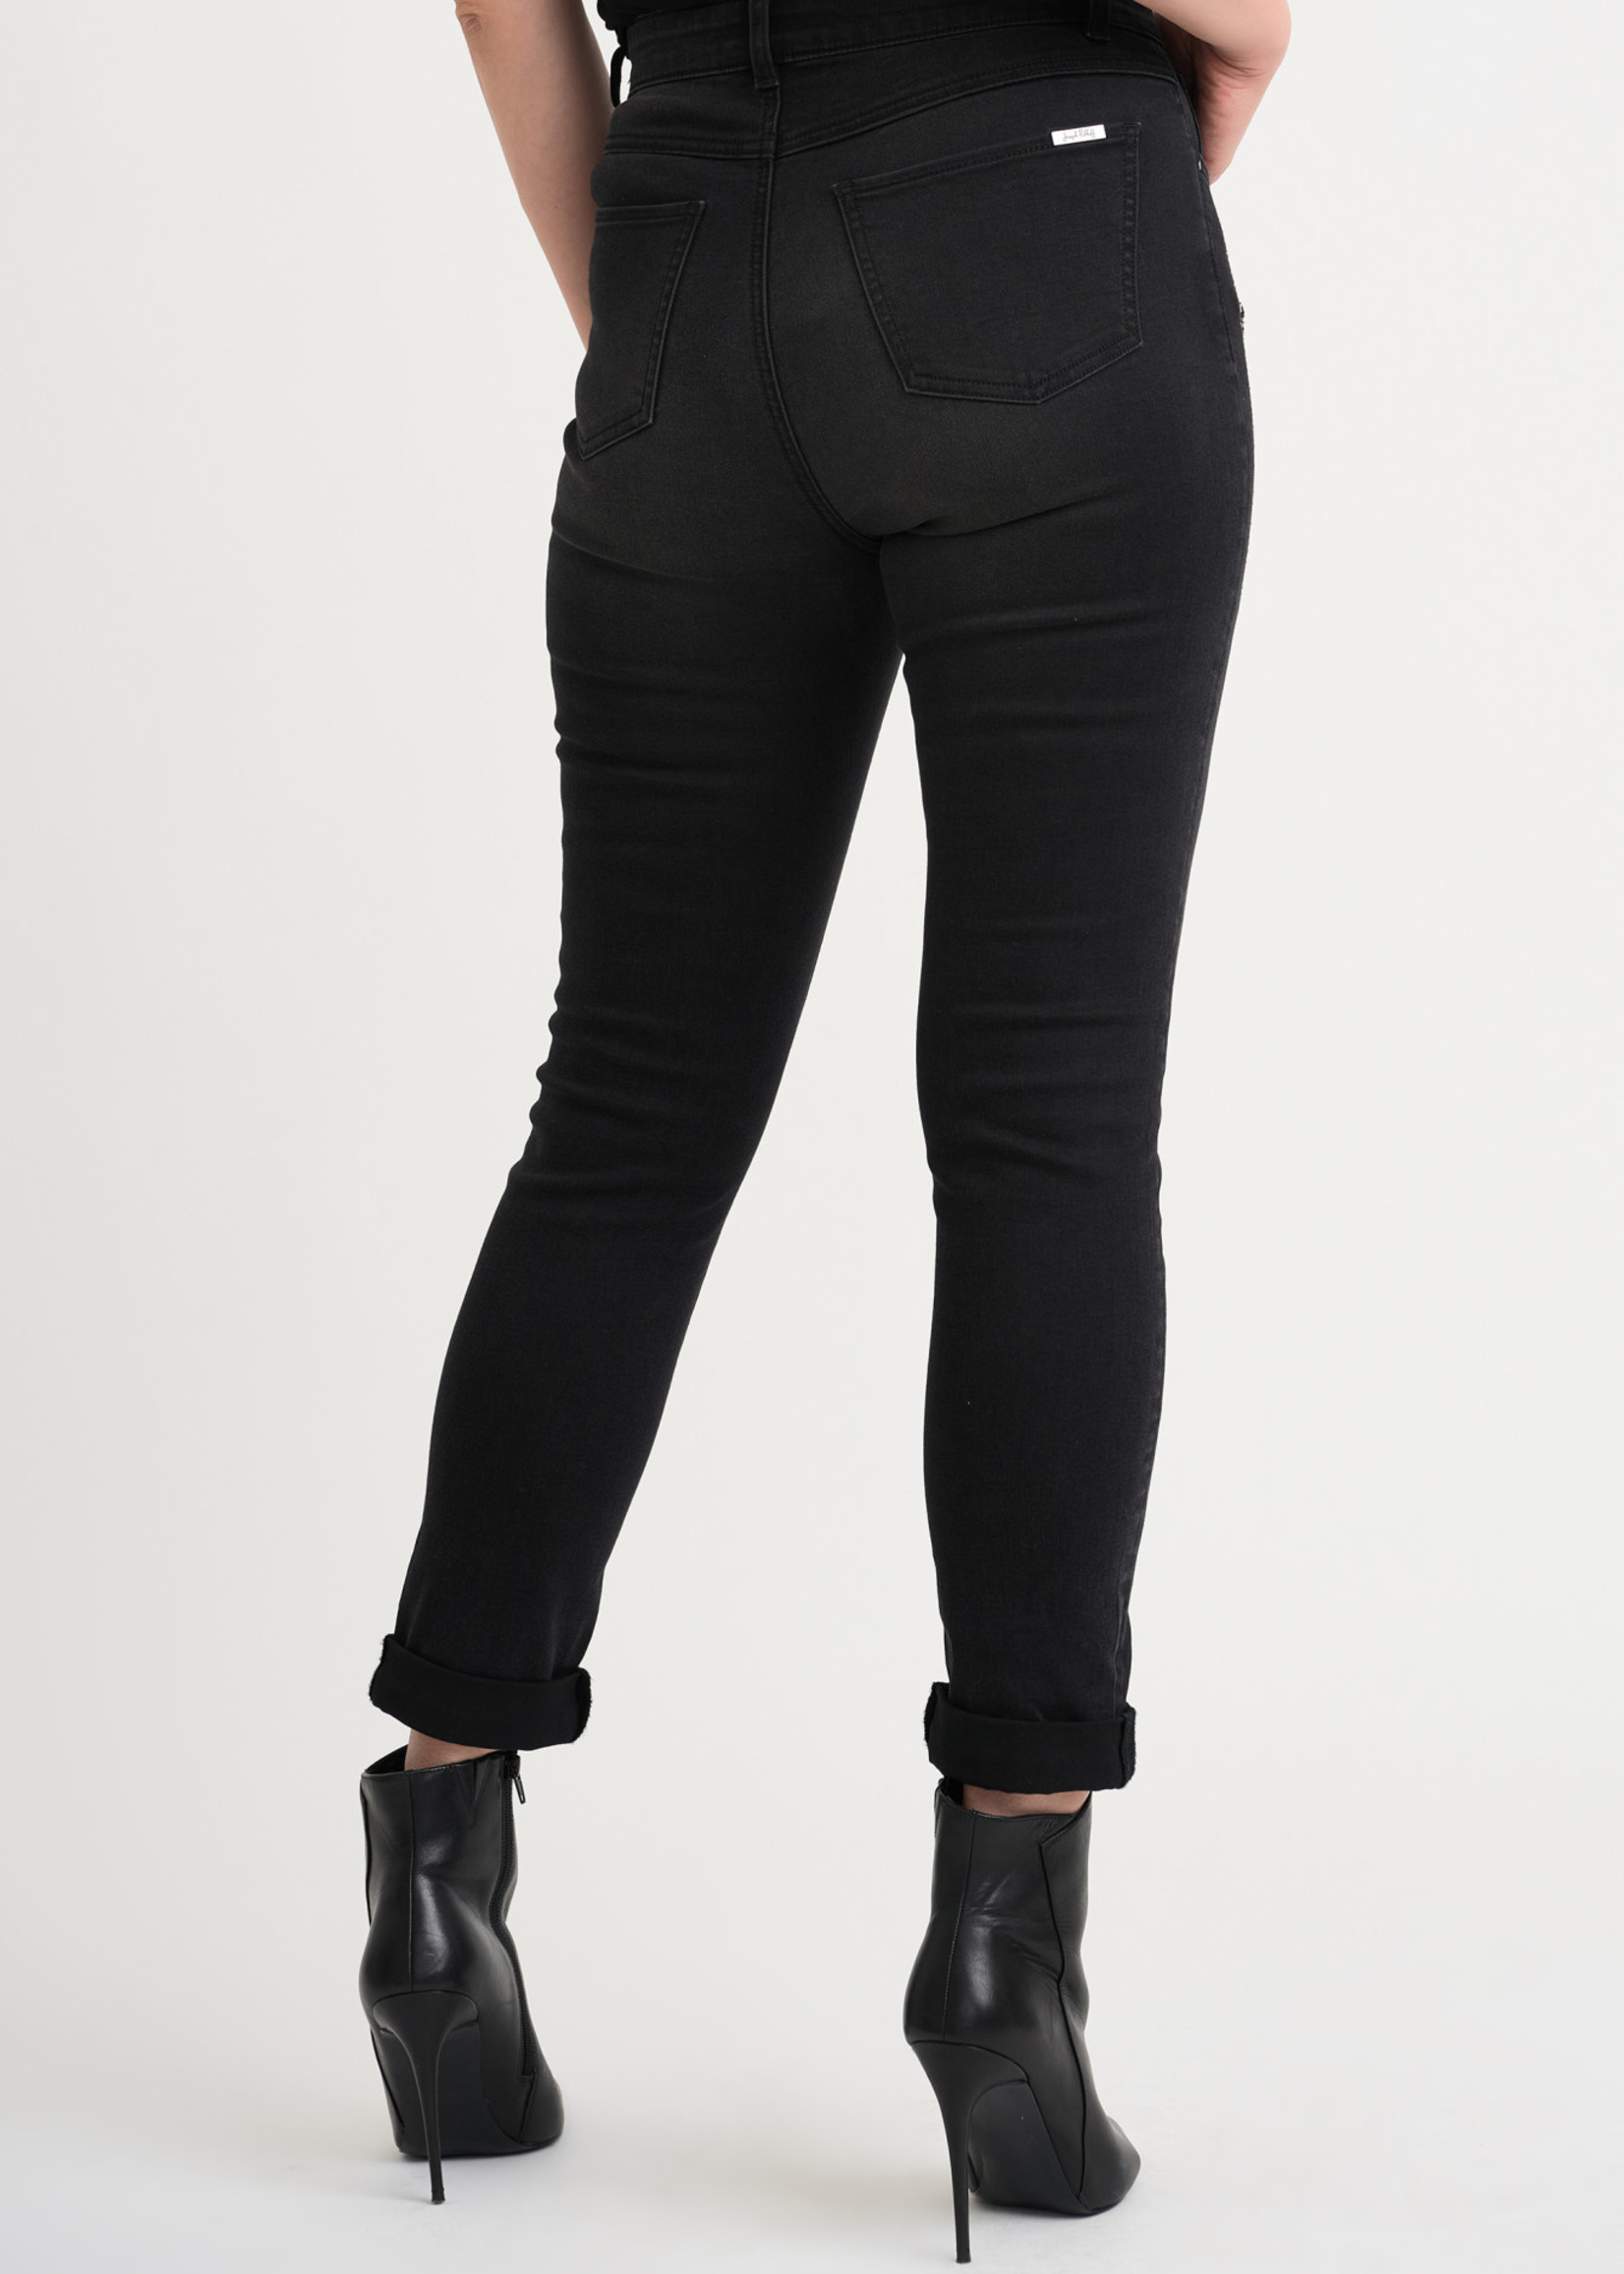 Joseph Ribkoff Joseph Ribkoff Black Jeans W/ Sequins